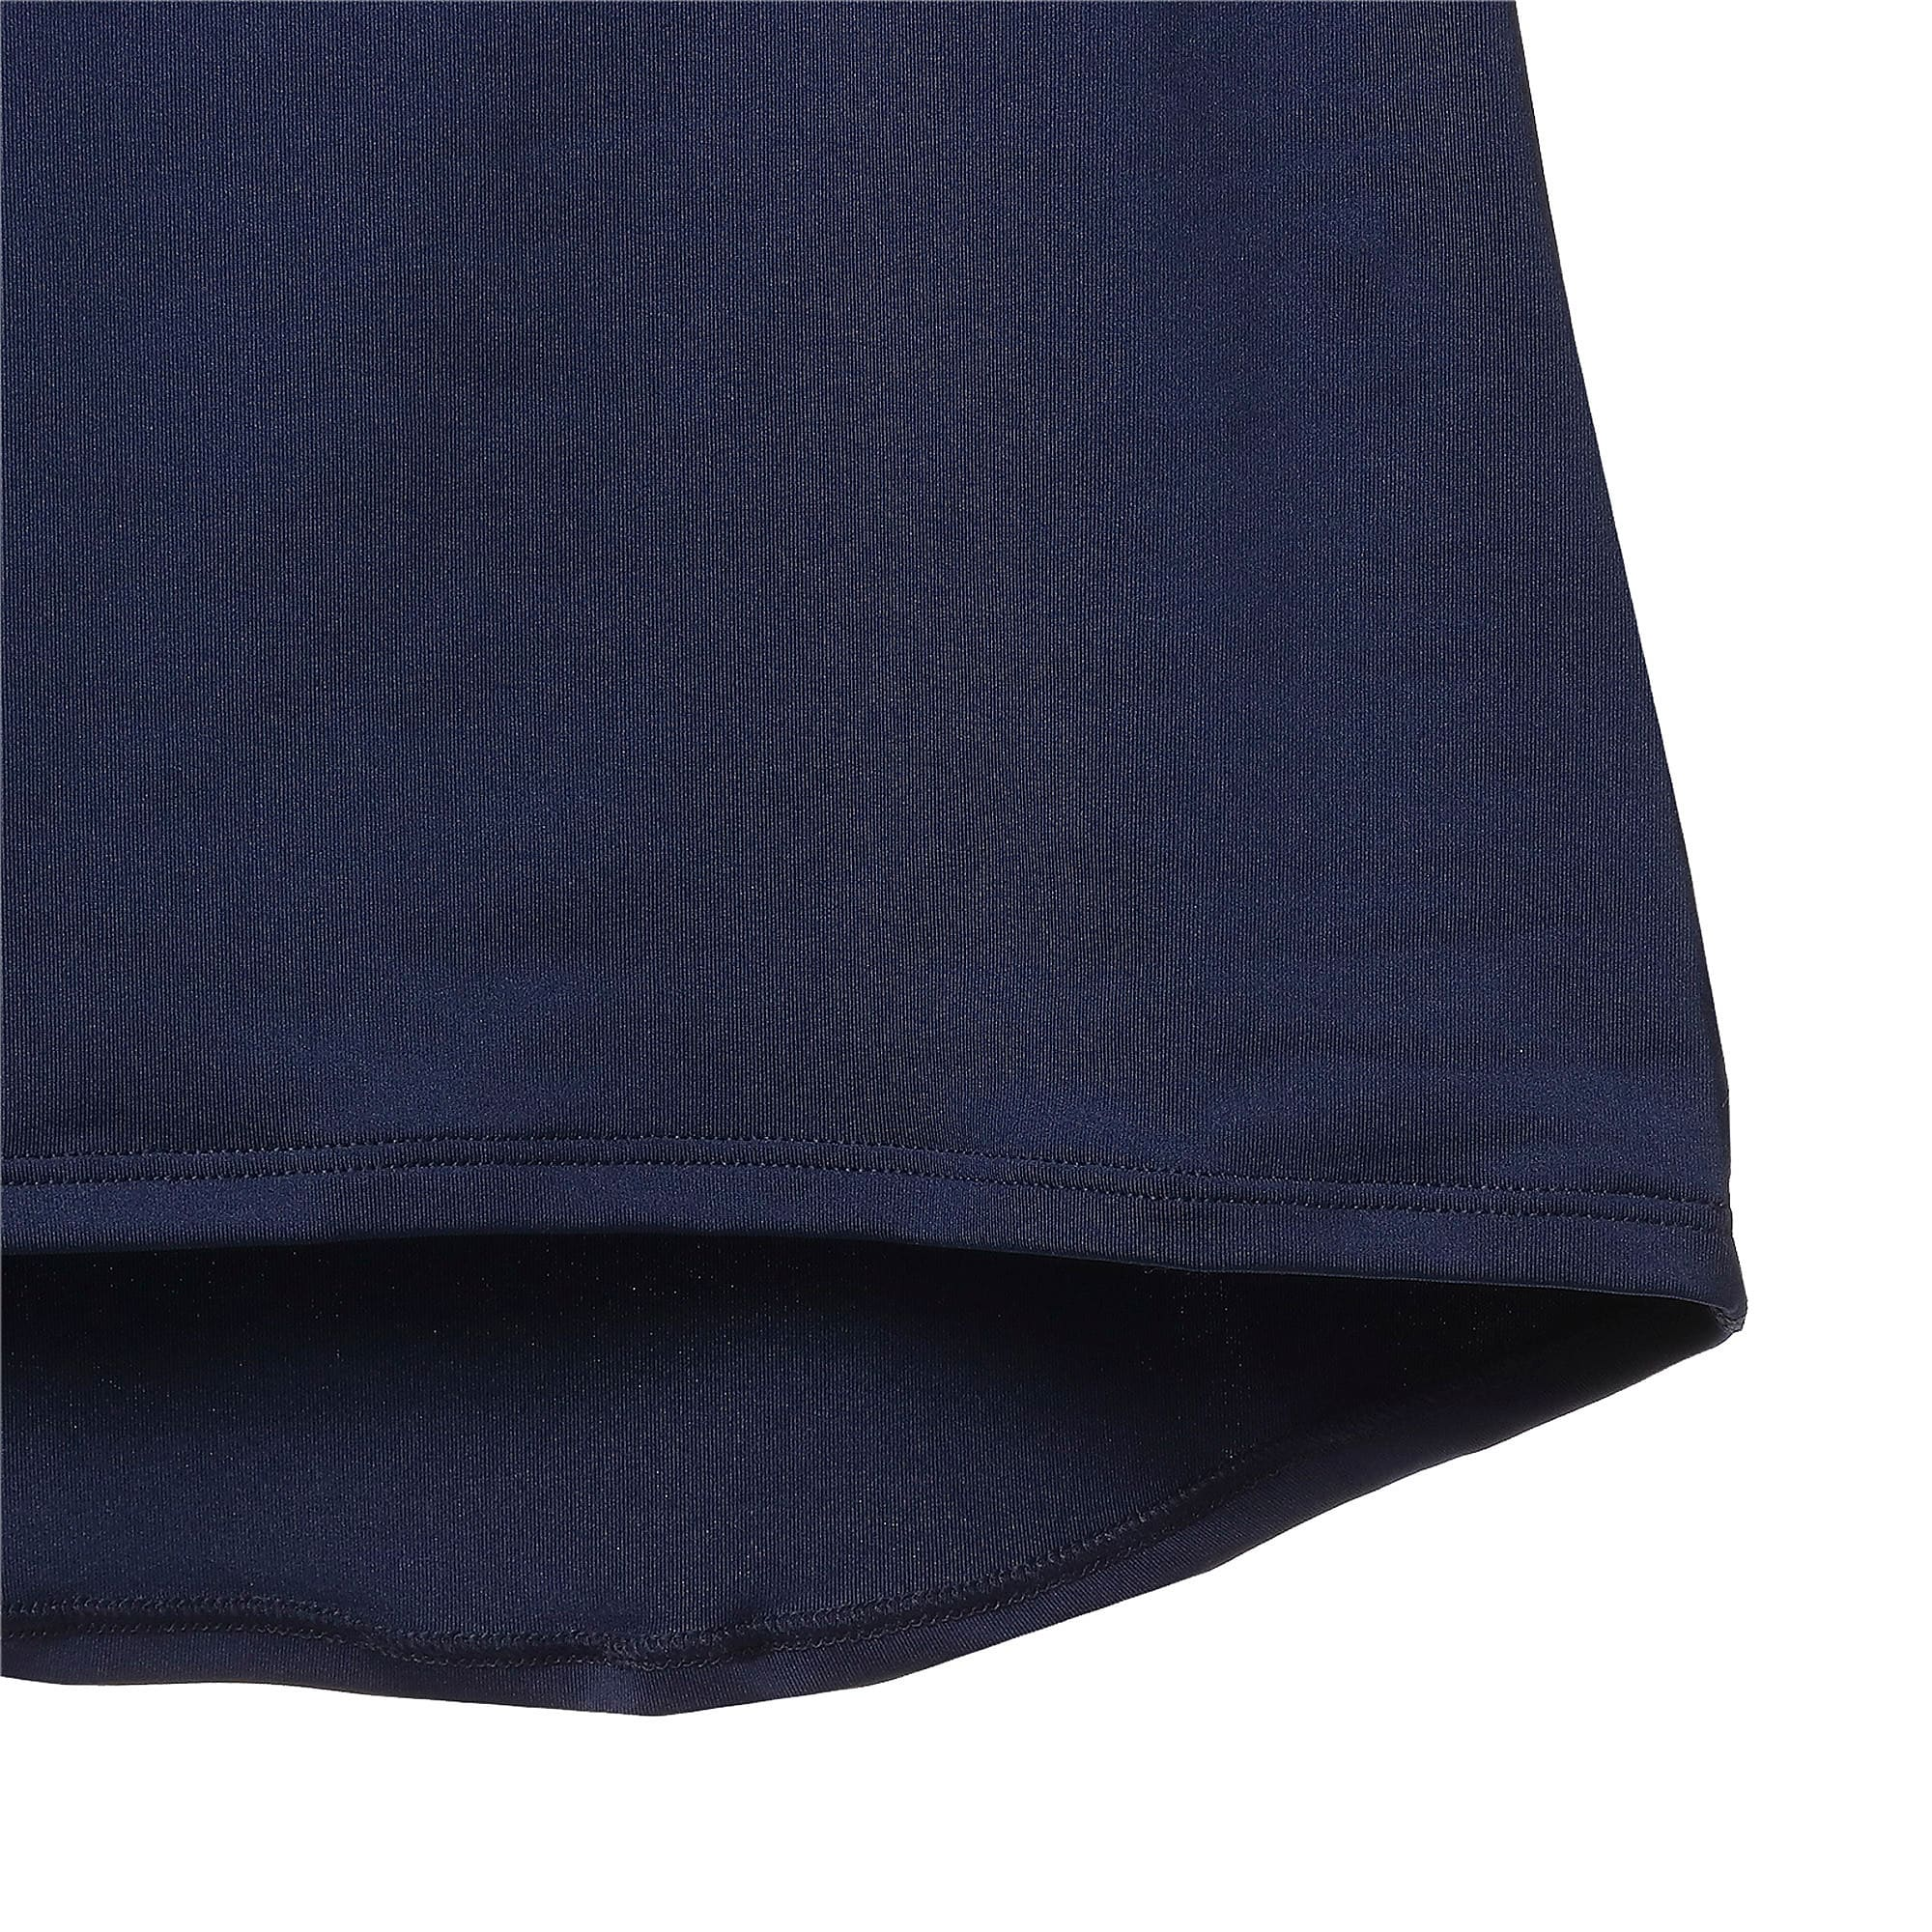 Thumbnail 6 of テック ライト LS ウィメンズ トレーニング Tシャツ 長袖, Peacoat, medium-JPN